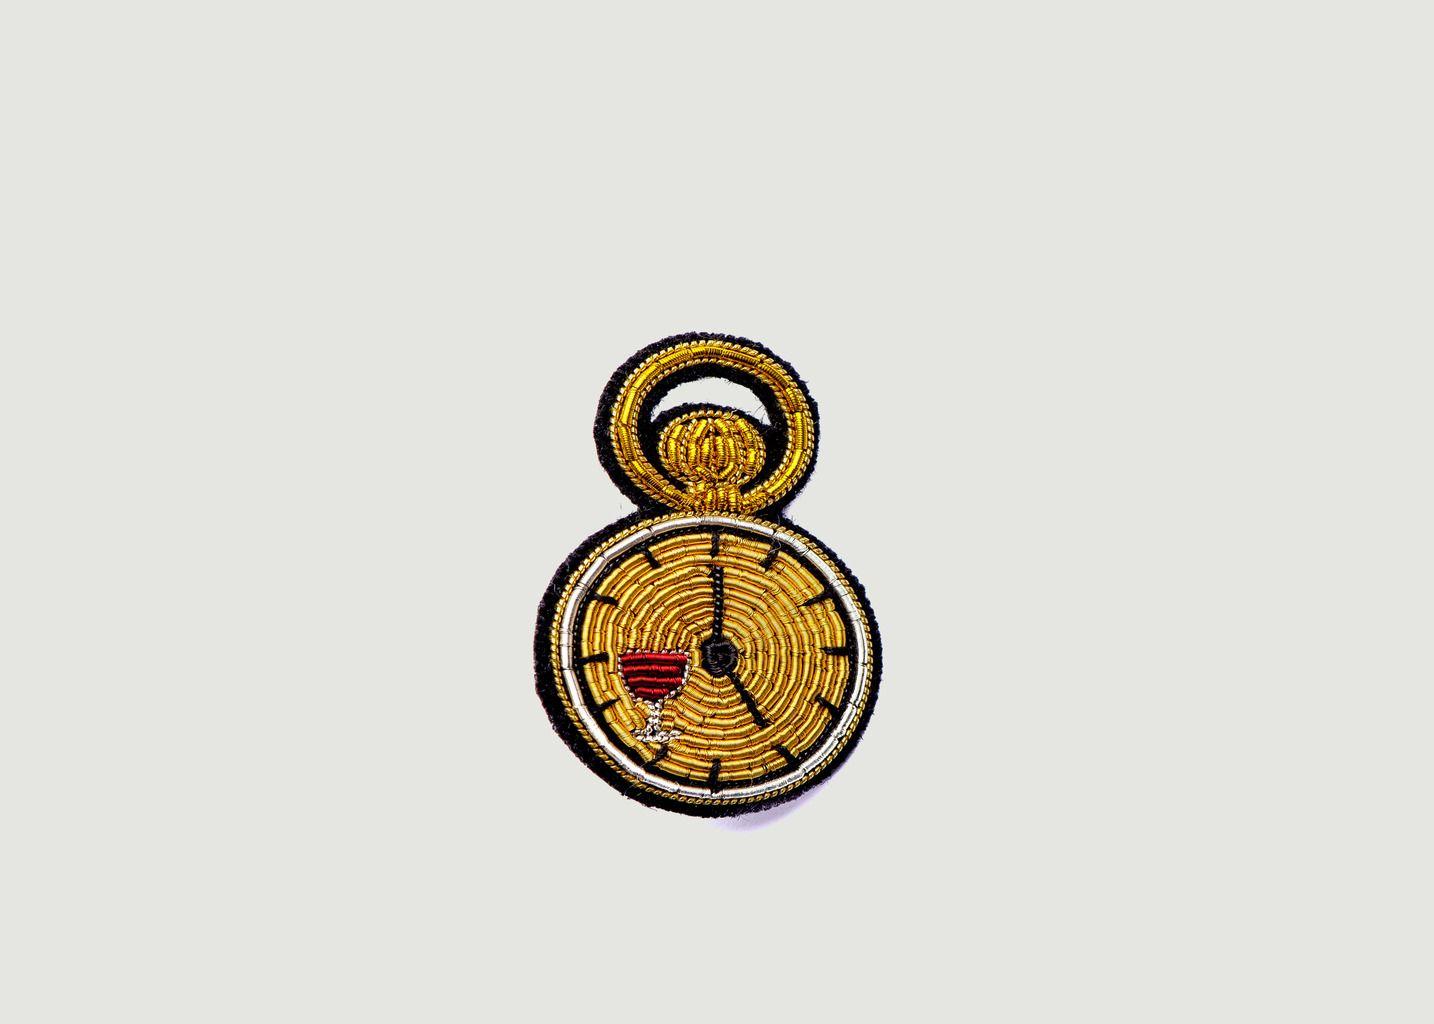 Broche Brodée Horloge - Macon & Lesquoy